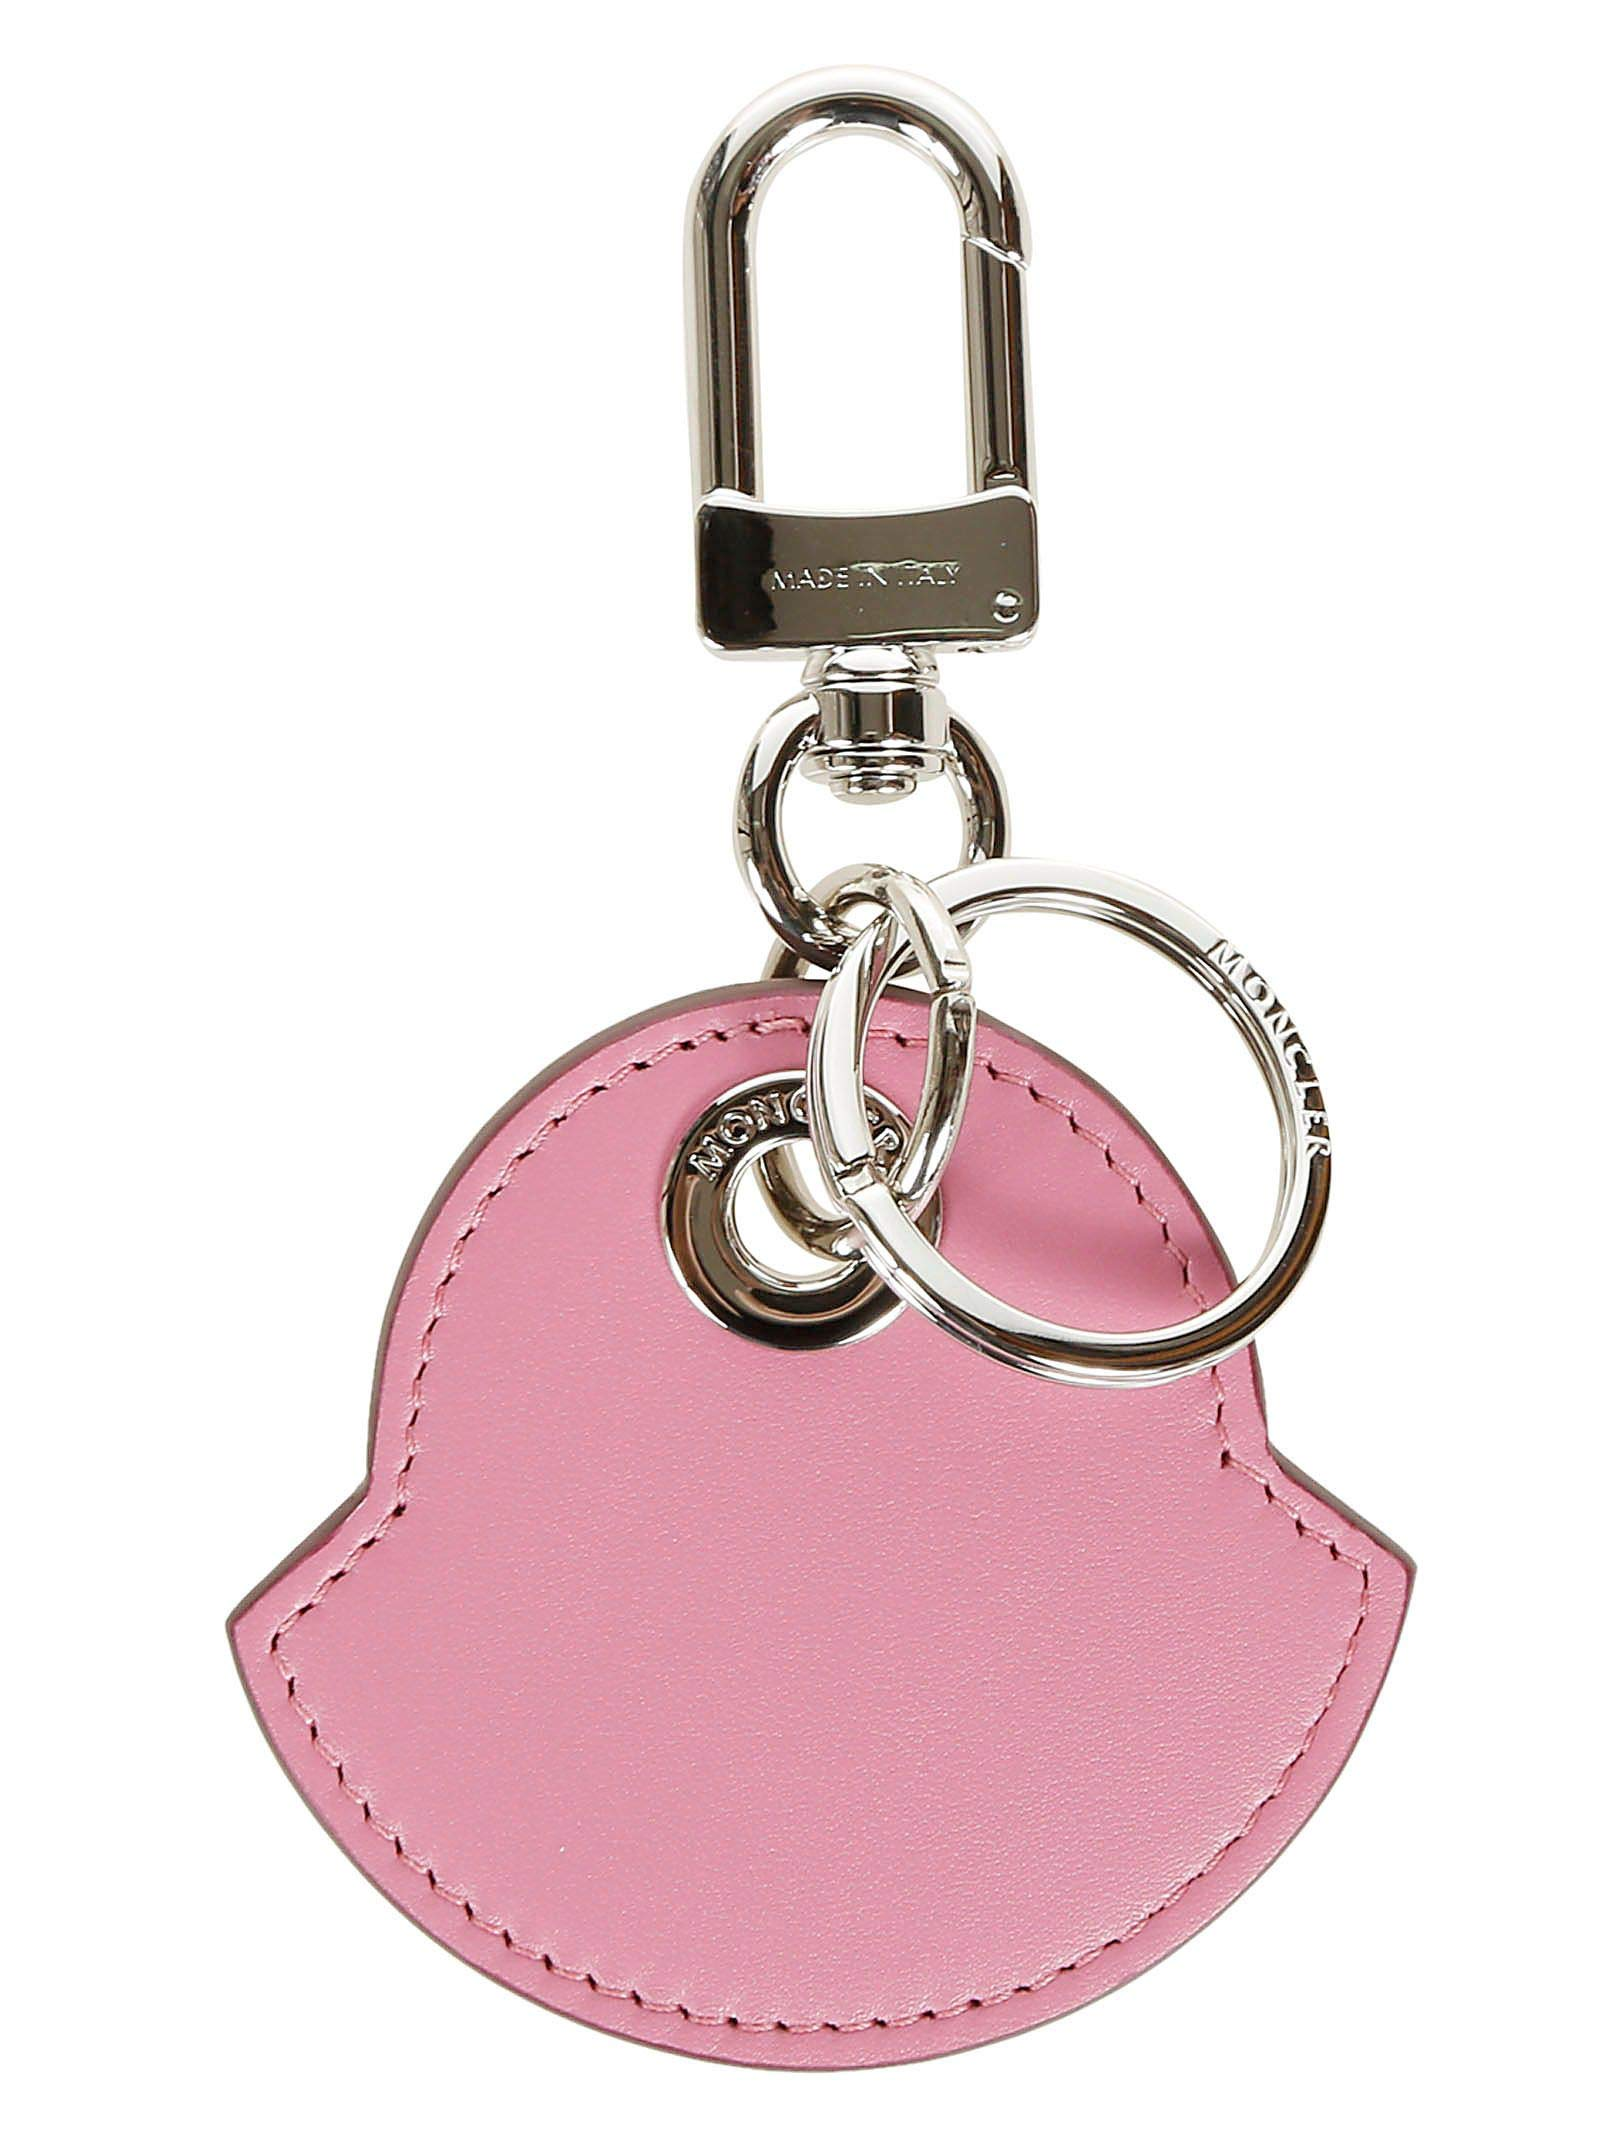 Moncler Genius Men's 008850750458 Pink Leather Key Chain